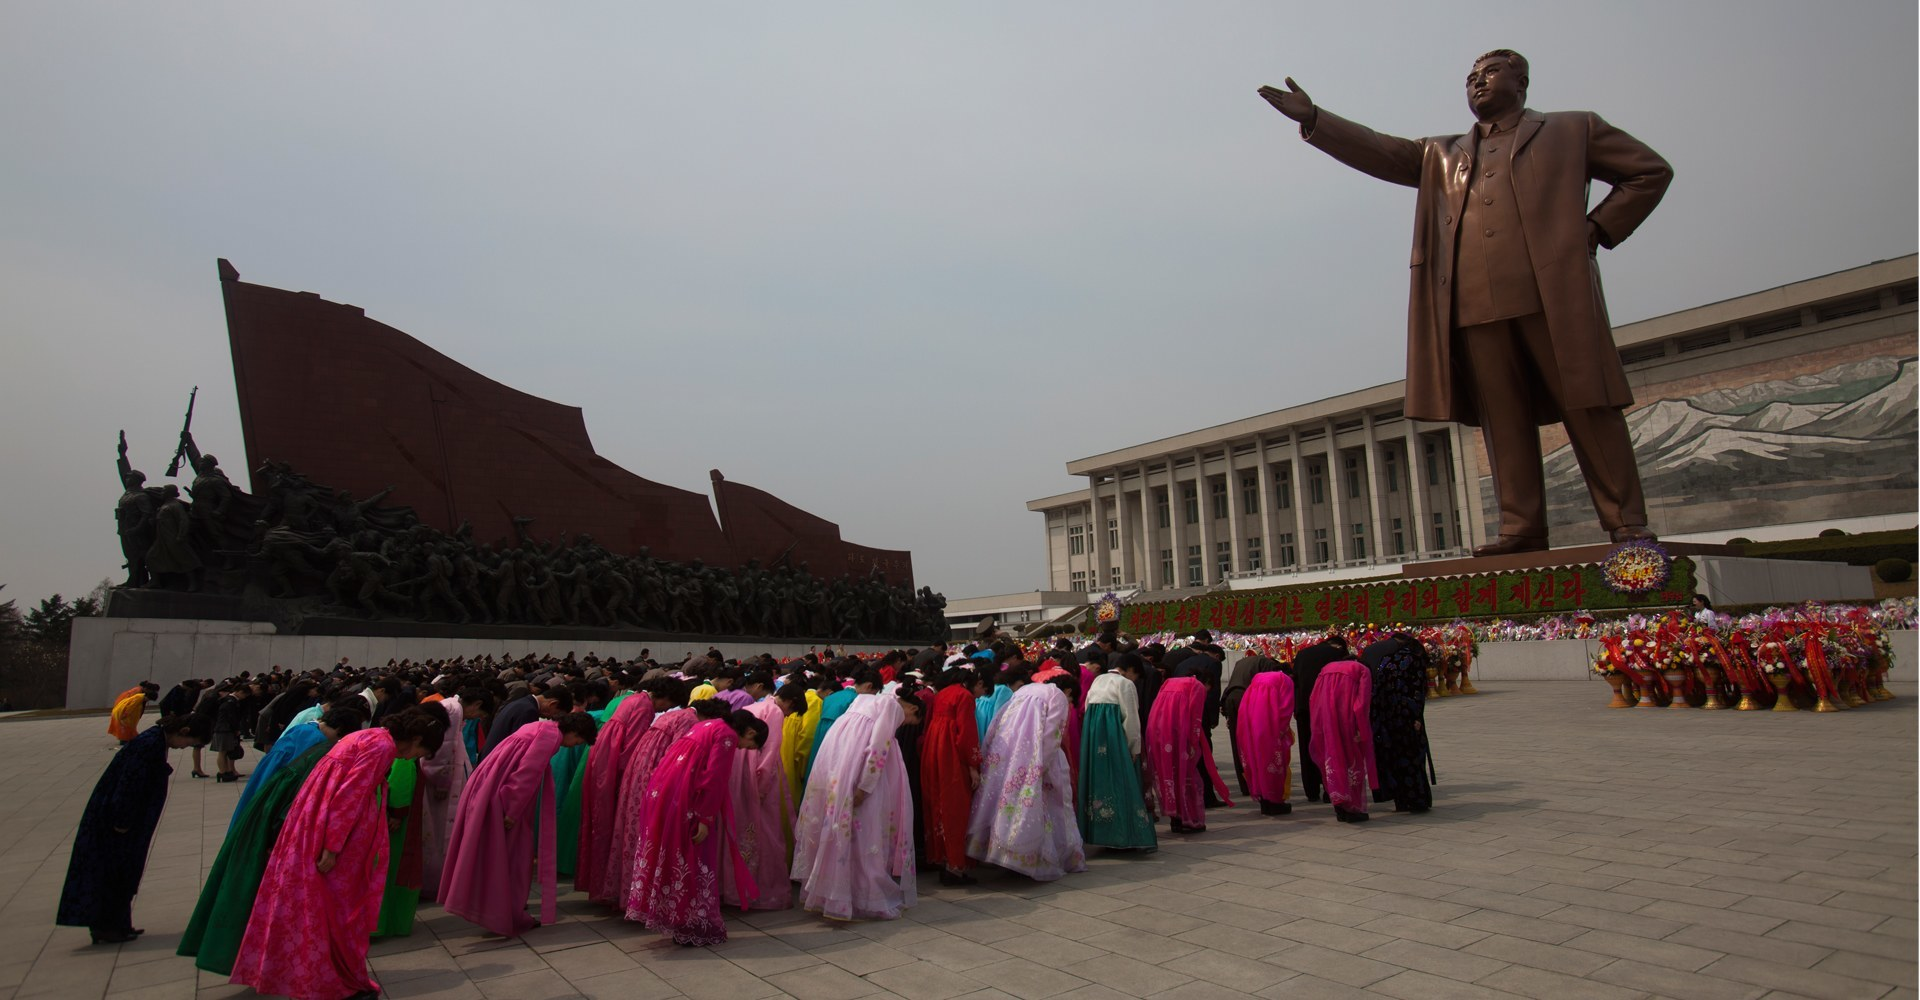 Kim Il Sung Monument - Pyongyang, North Korea